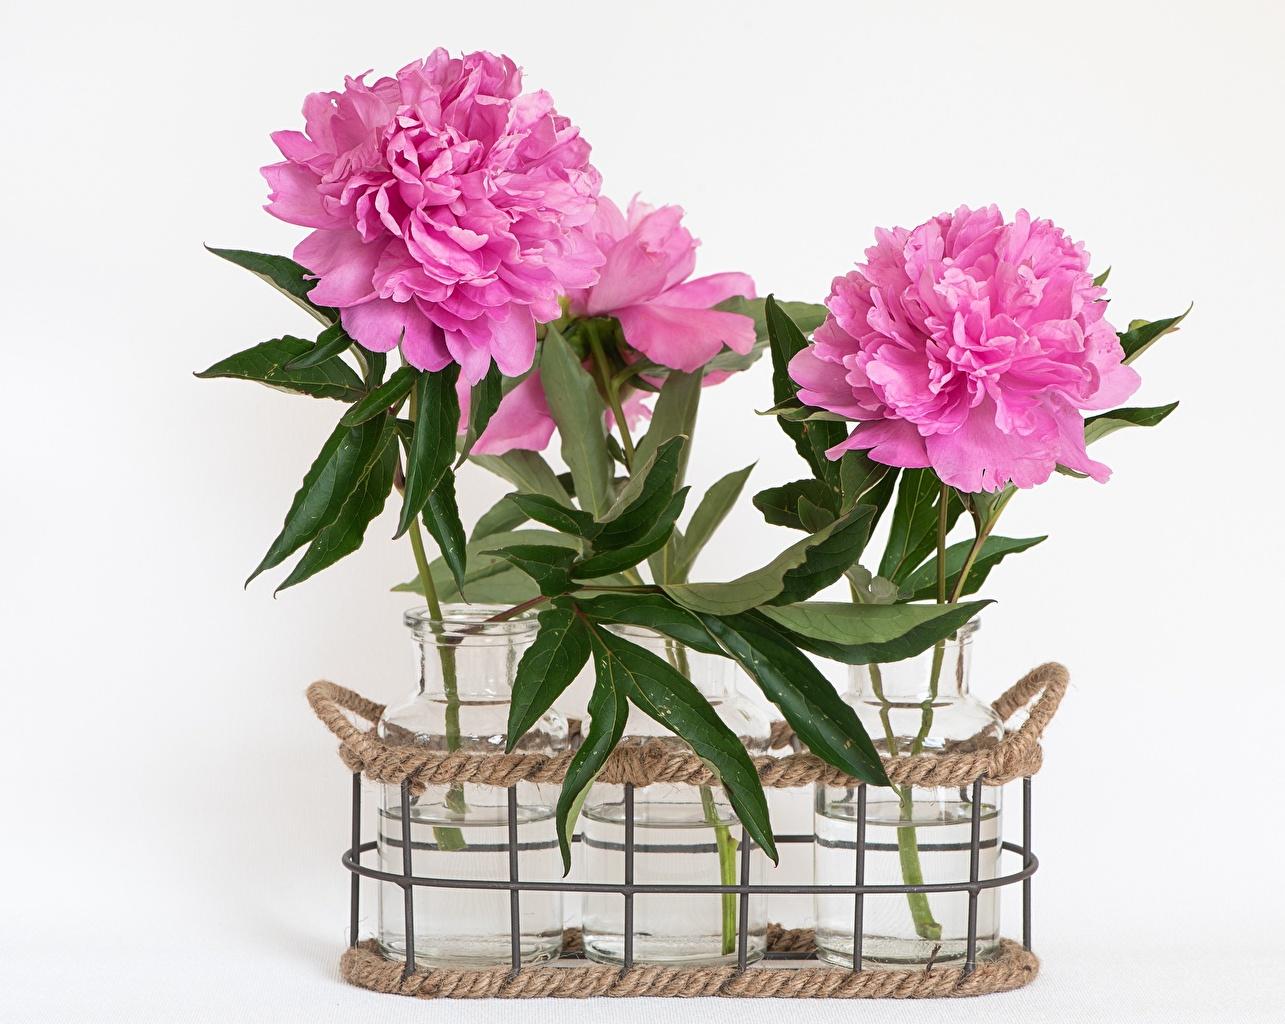 Картинка Розовый пион банке цветок Корзинка Серый фон розовая розовые розовых Пионы Банка банки Цветы Корзина корзины сером фоне